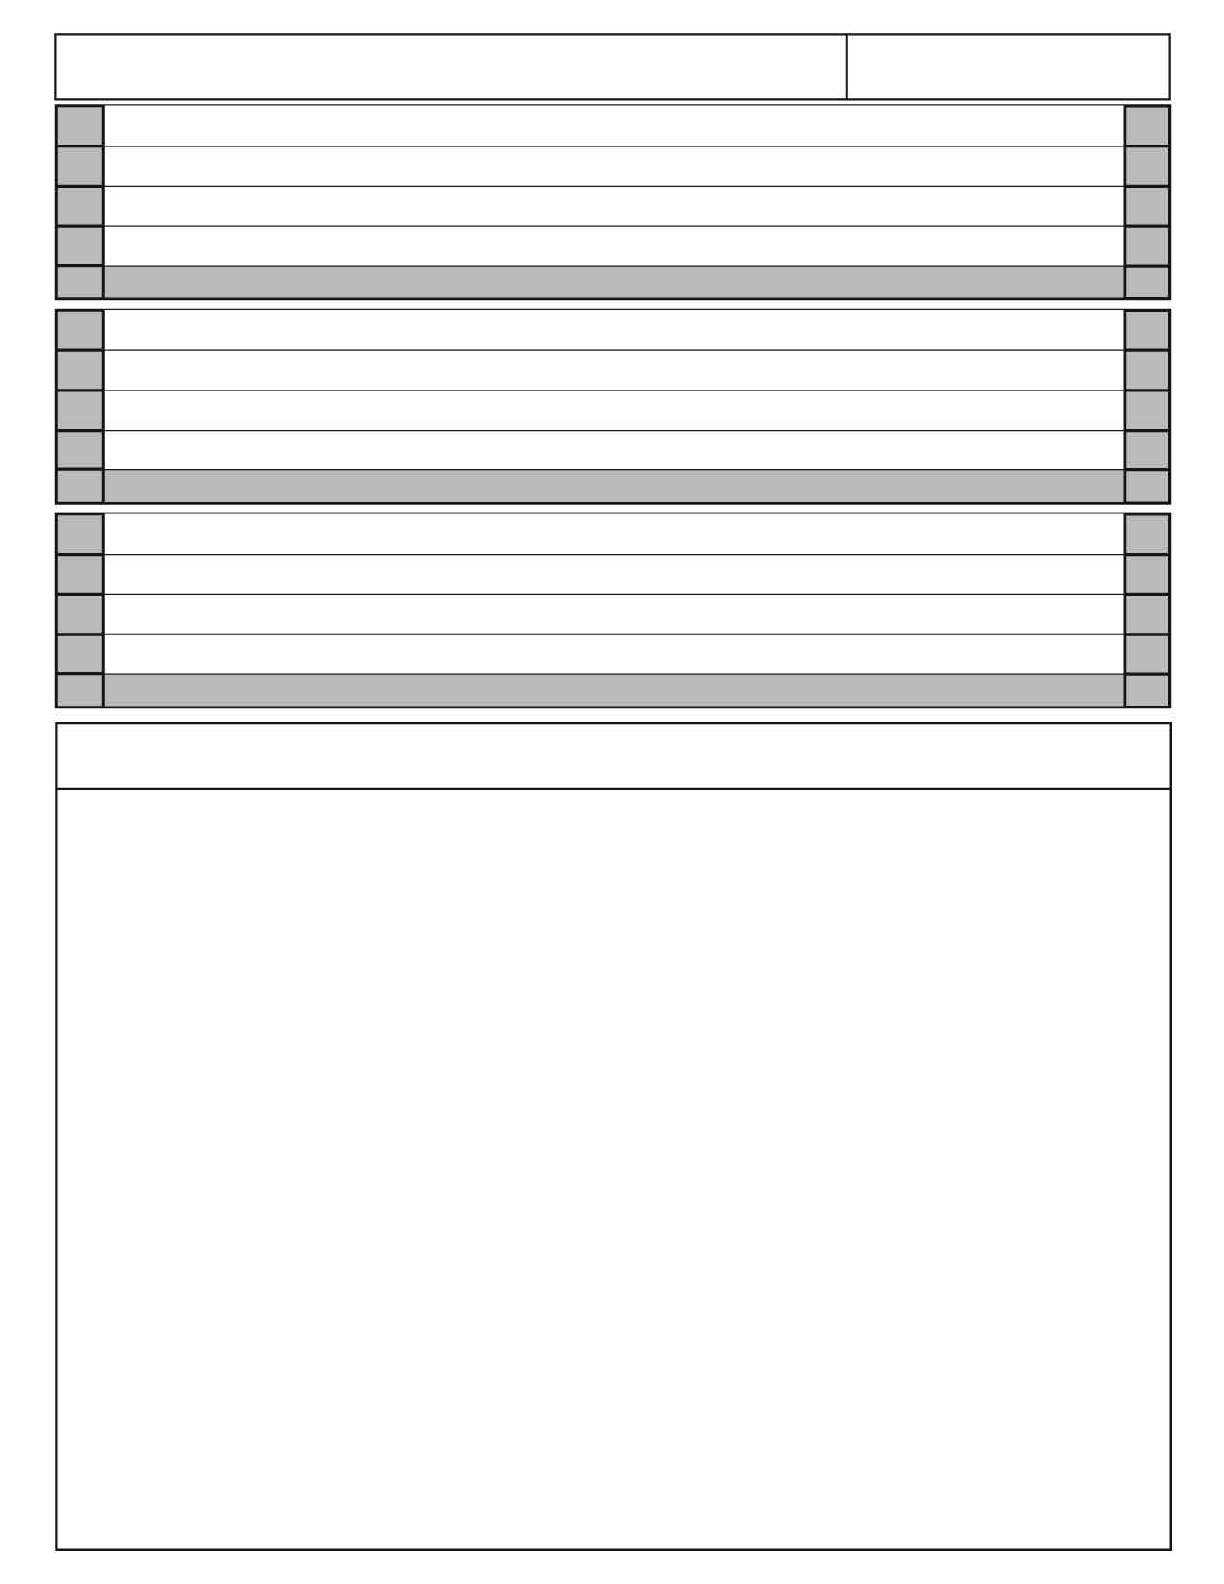 Free Printable Dollar Tree Job Application Form Page 2